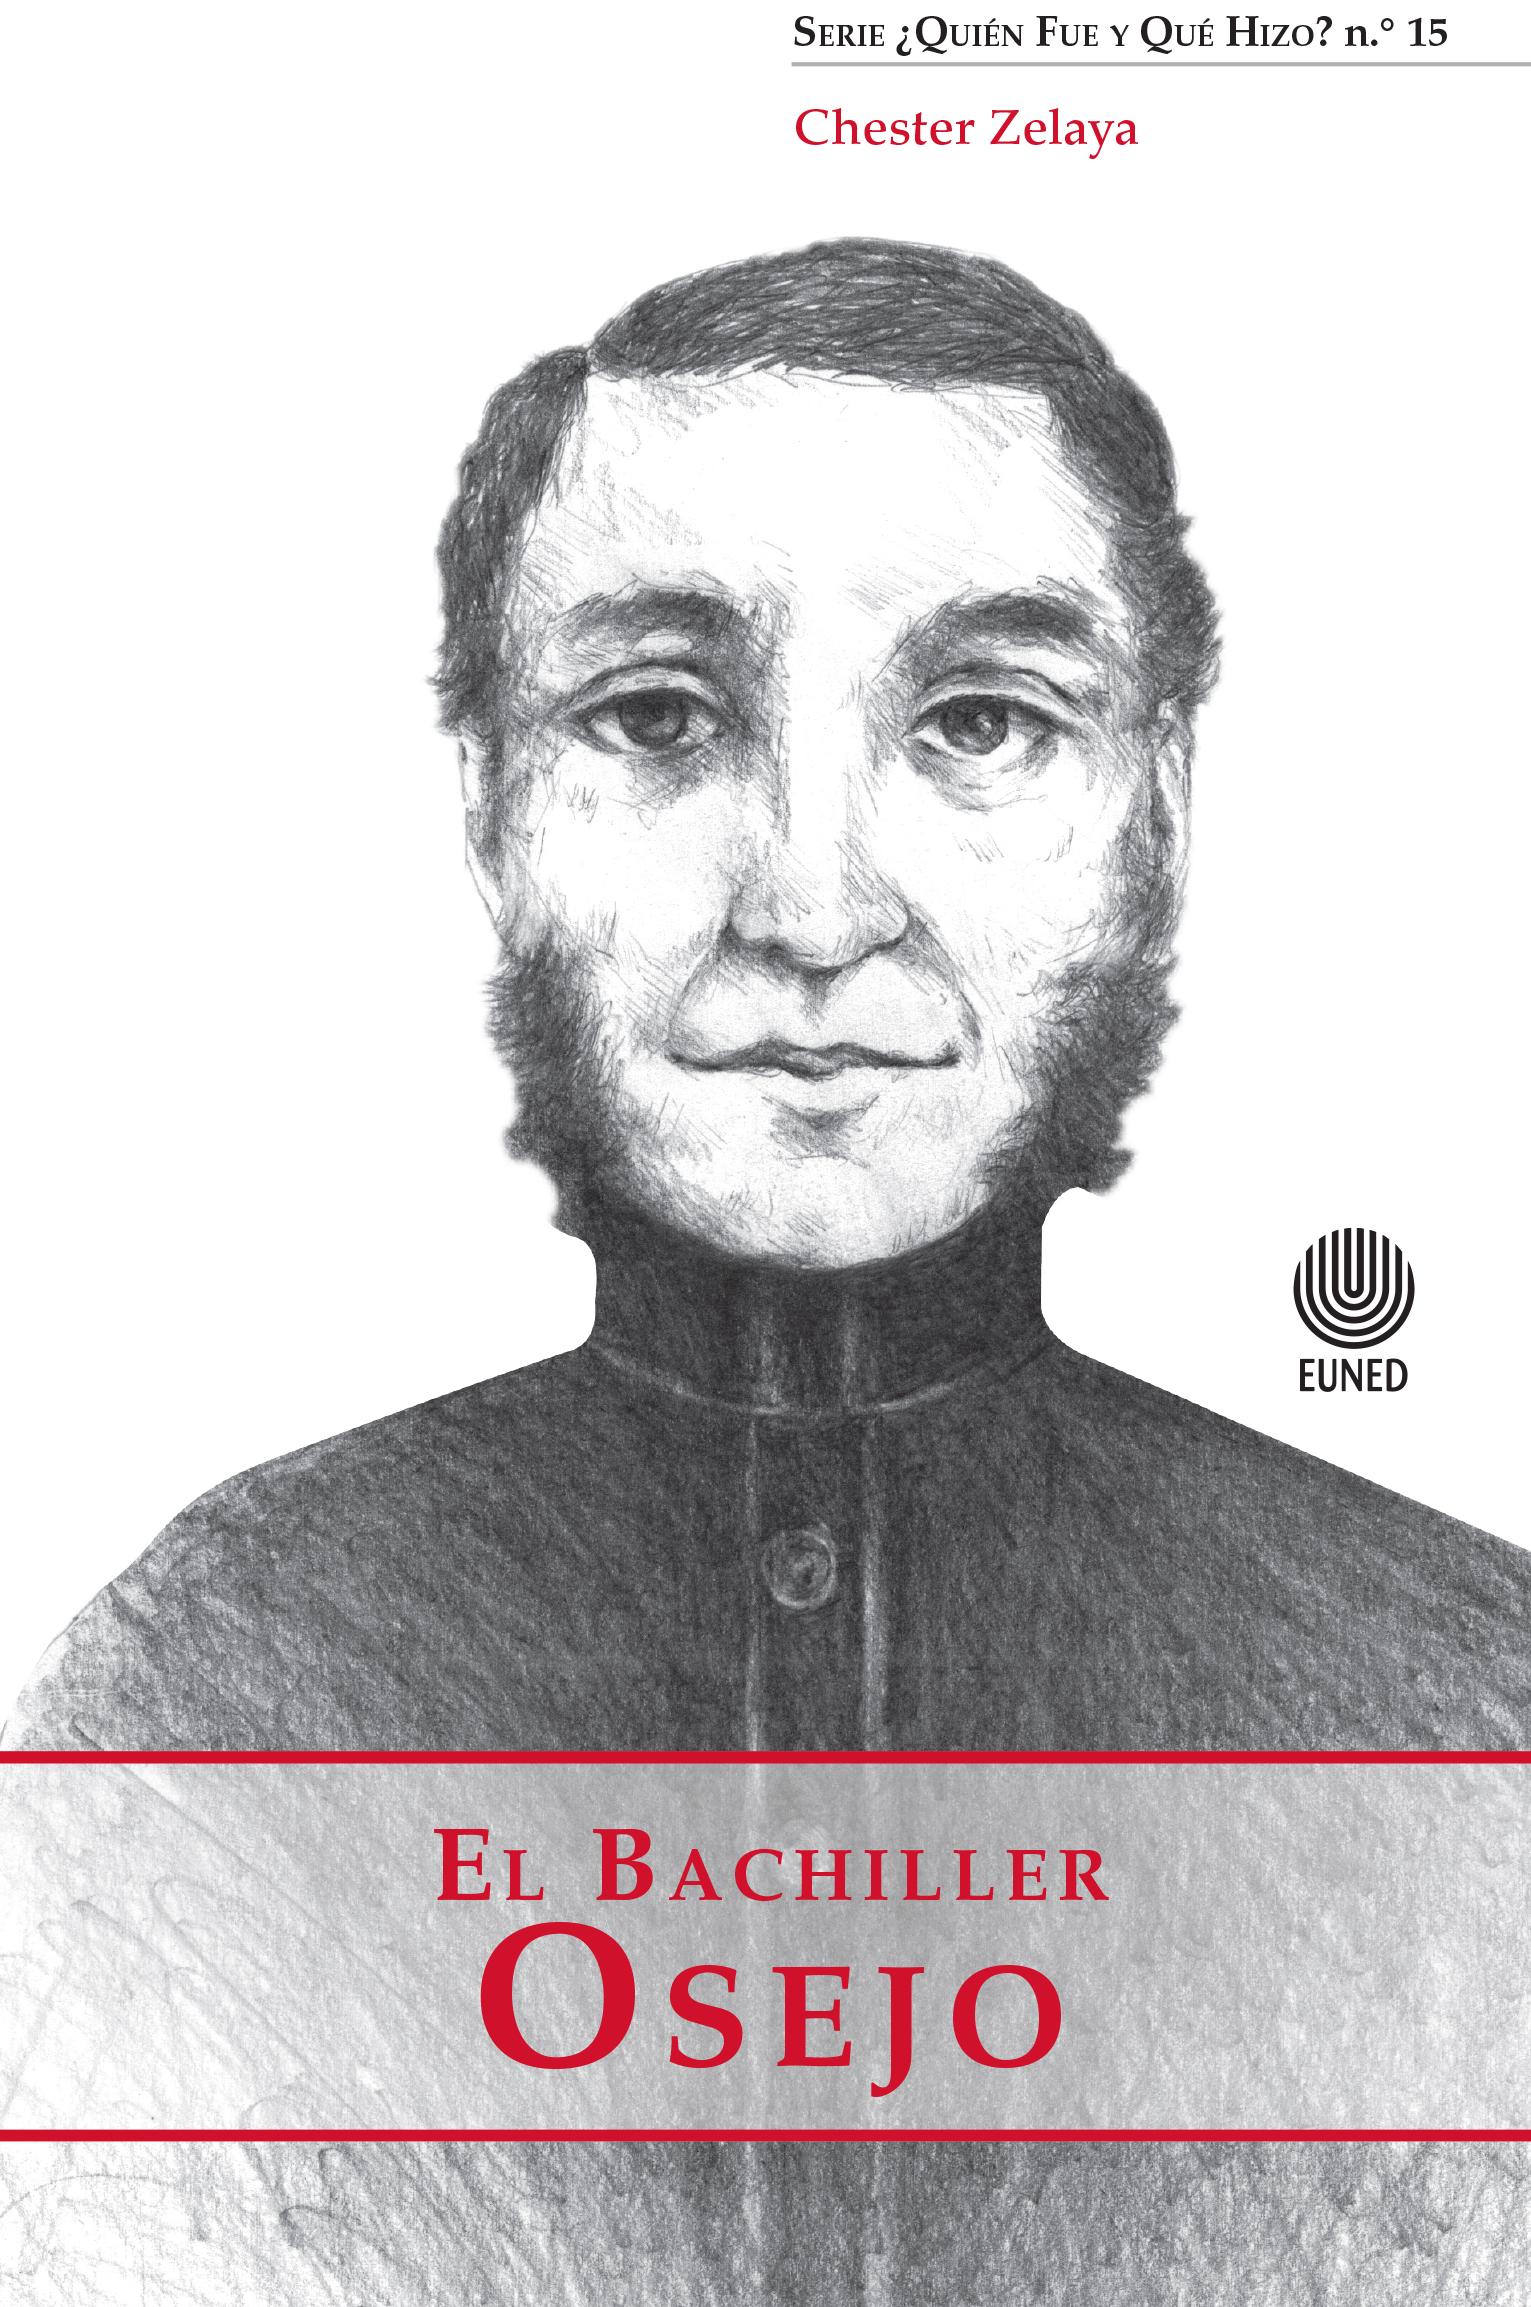 El Bachiller Osejo